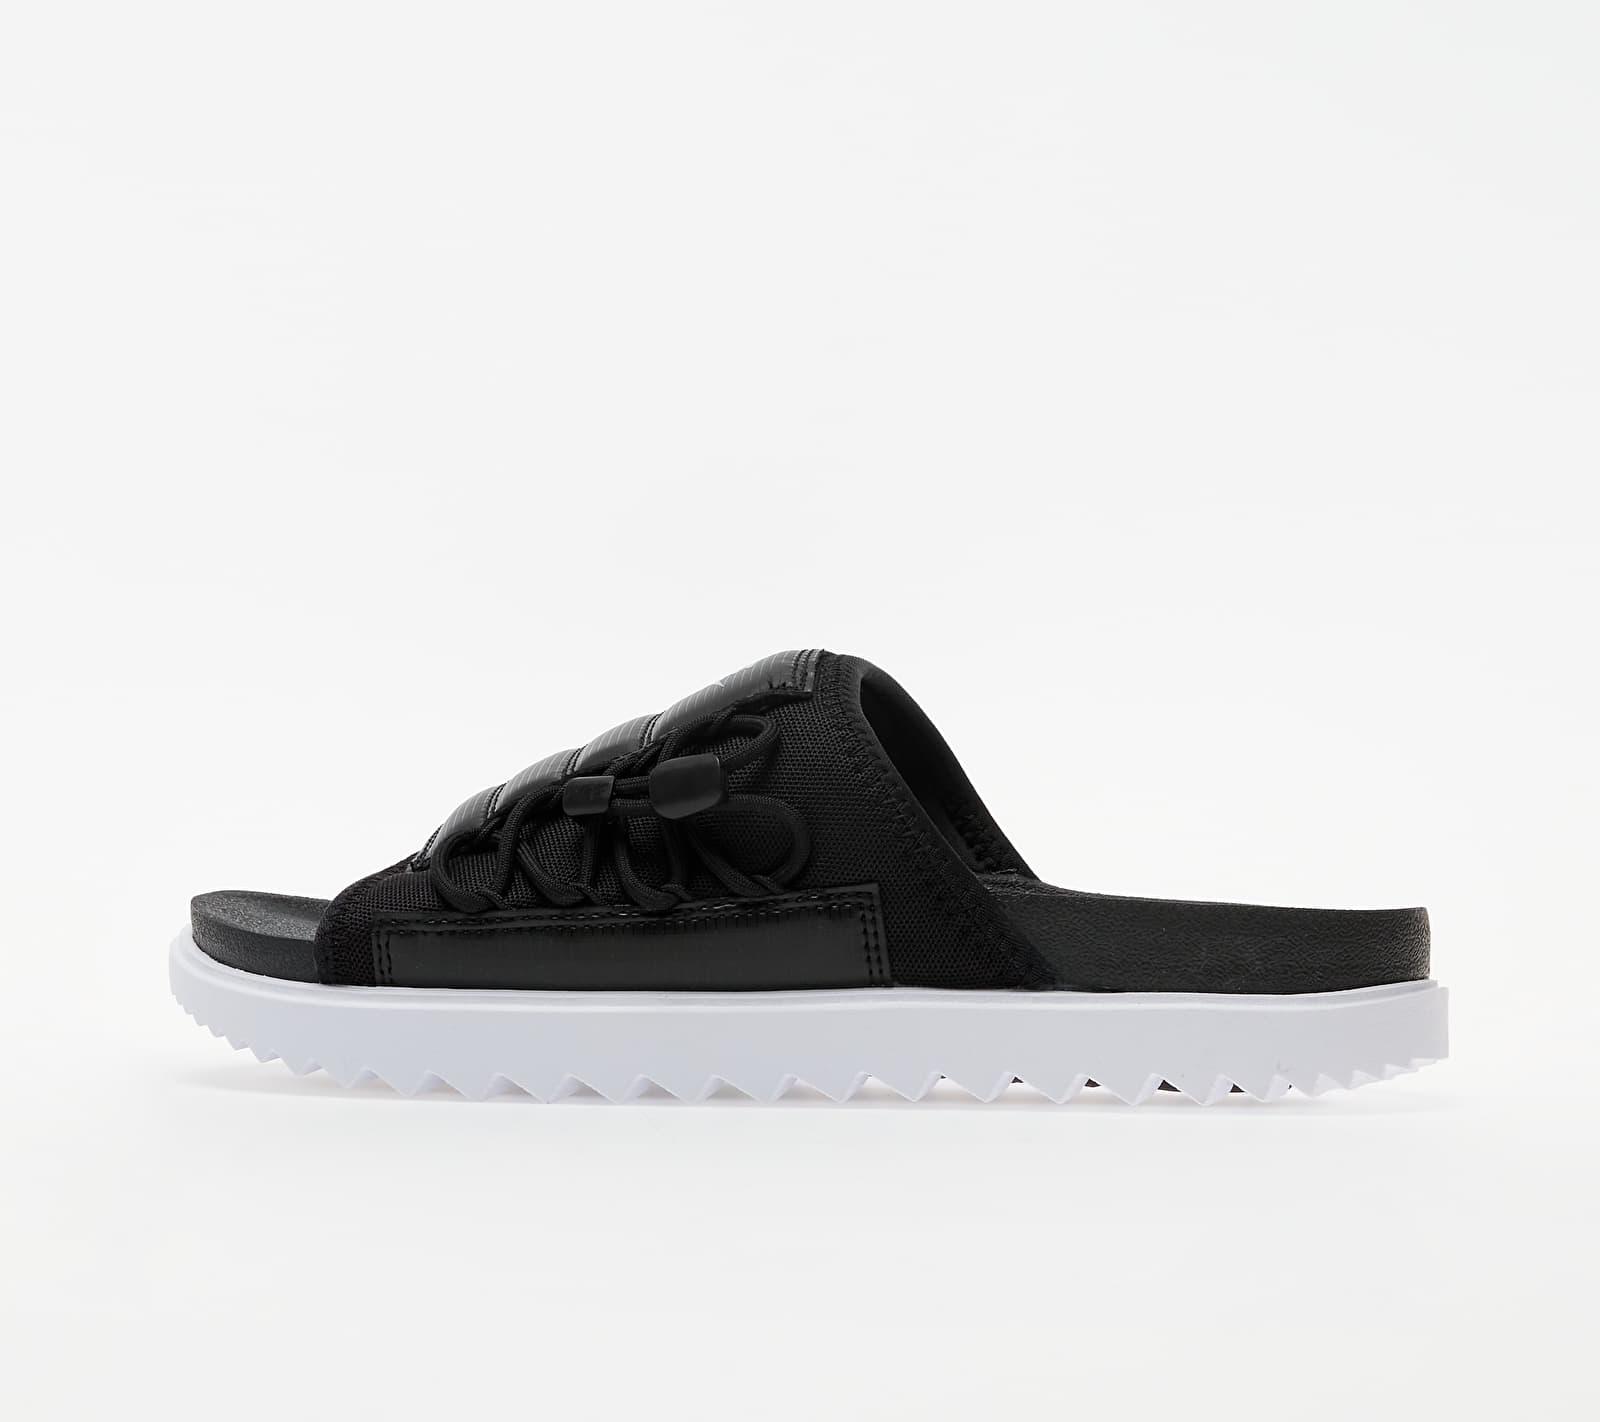 Nike Asuna Slide Black/ Anthracite-White EUR 41